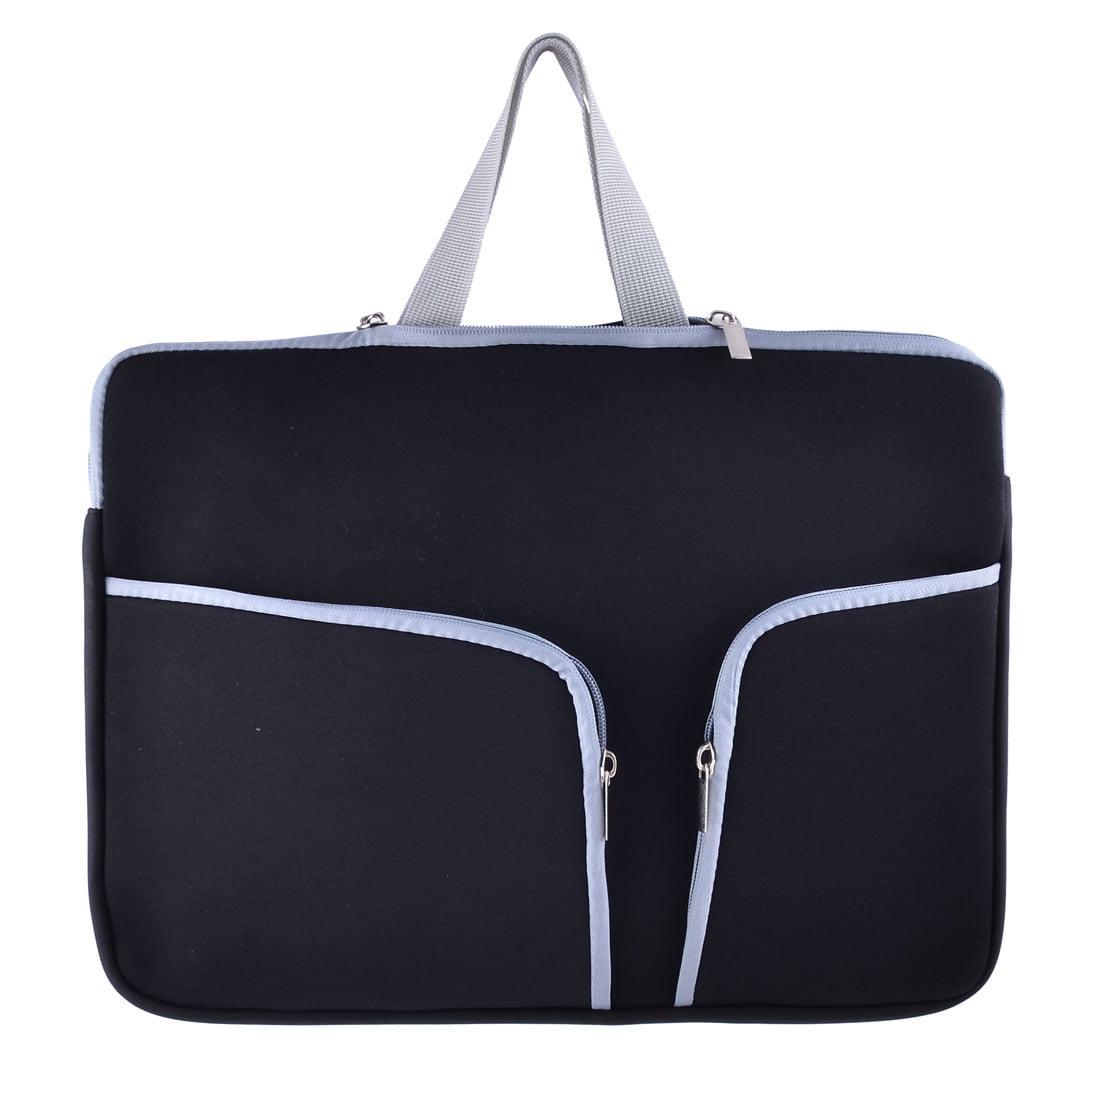 15.6  Polyester Shockproof Notebook Laptop Sleeve Carrying Bag Black